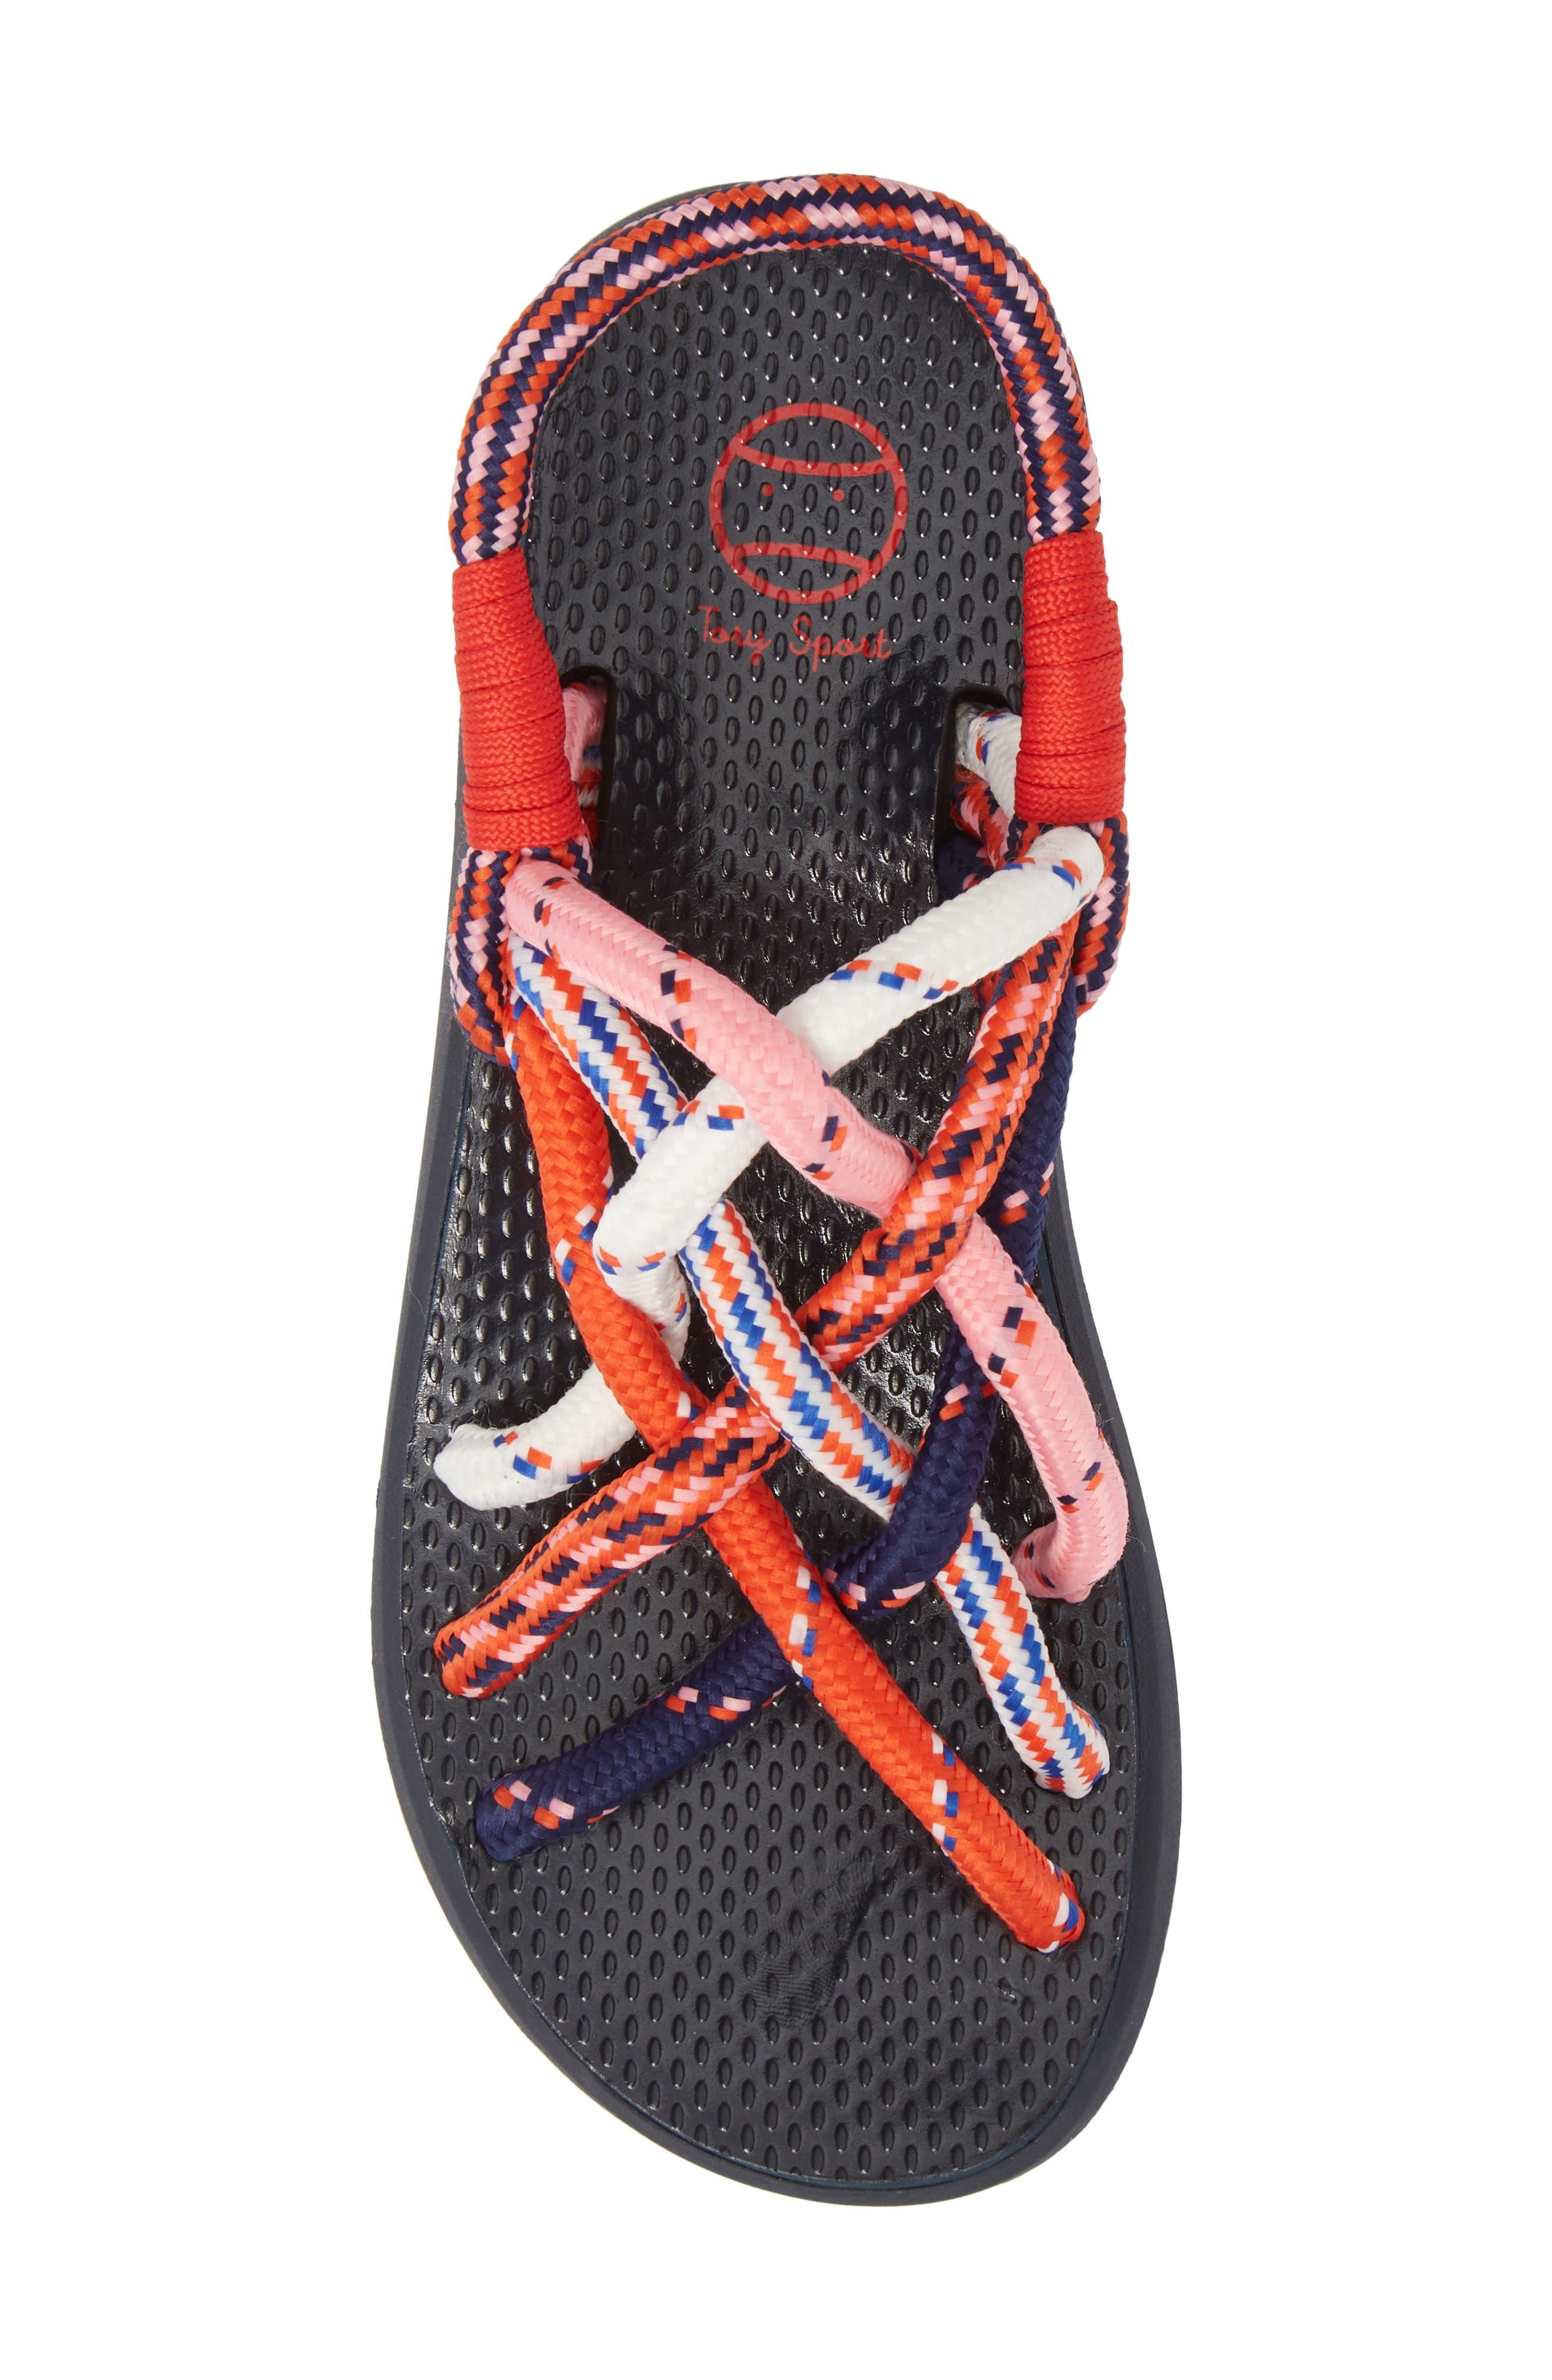 Rope Sandal,                             Alternate thumbnail 5, color,                             643